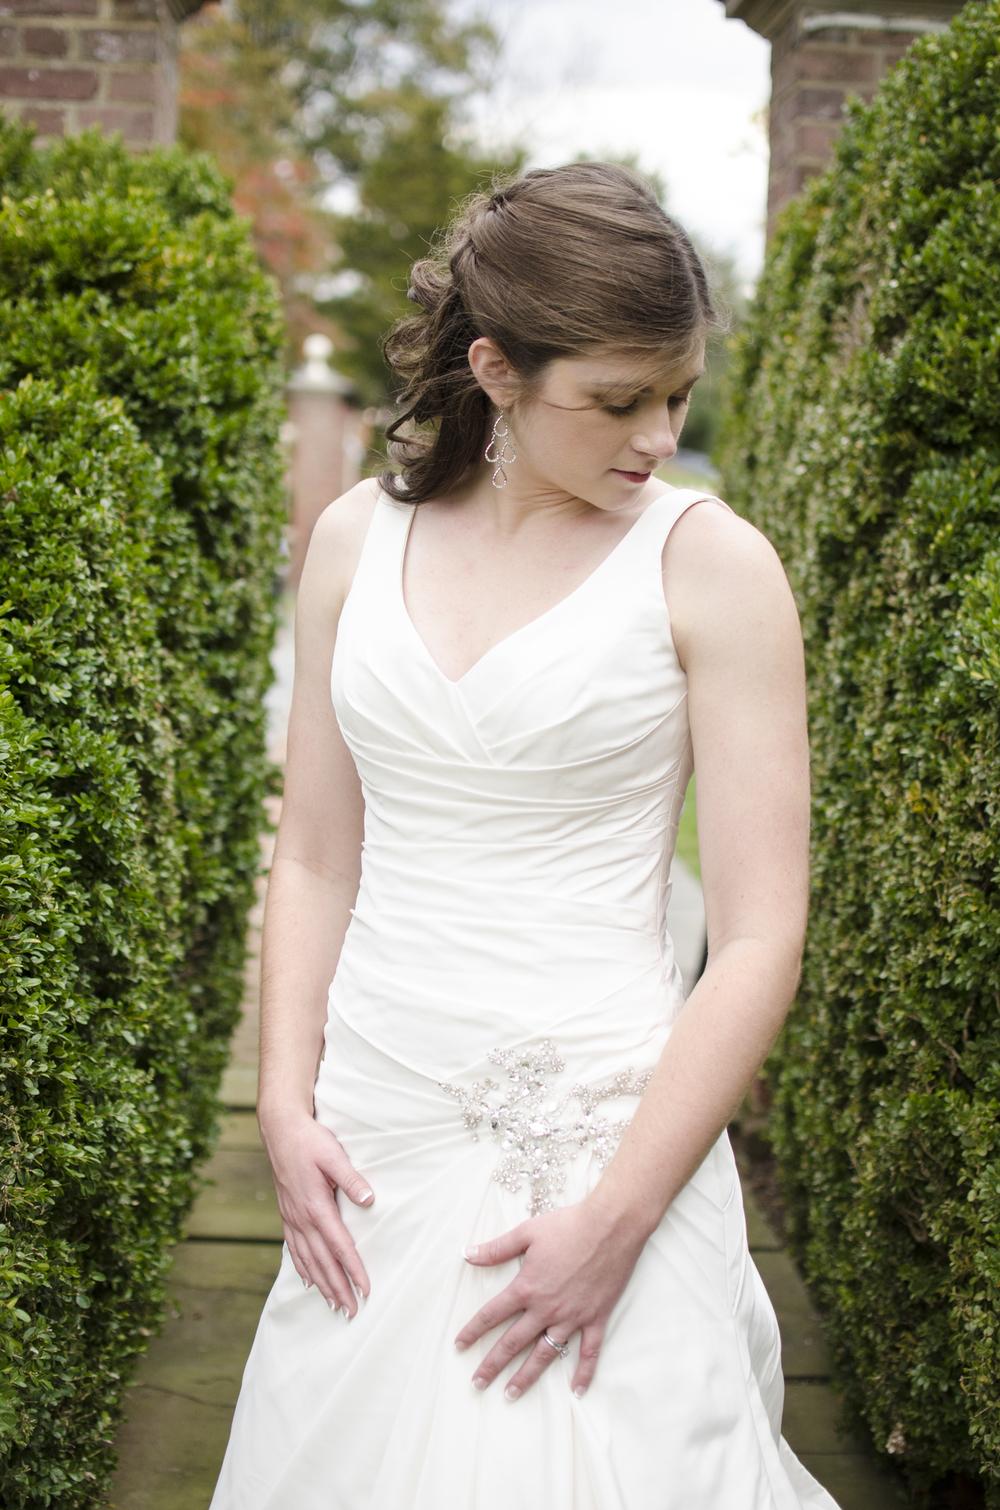 Bride at Newton White Mansion in Baltimore, Maryland